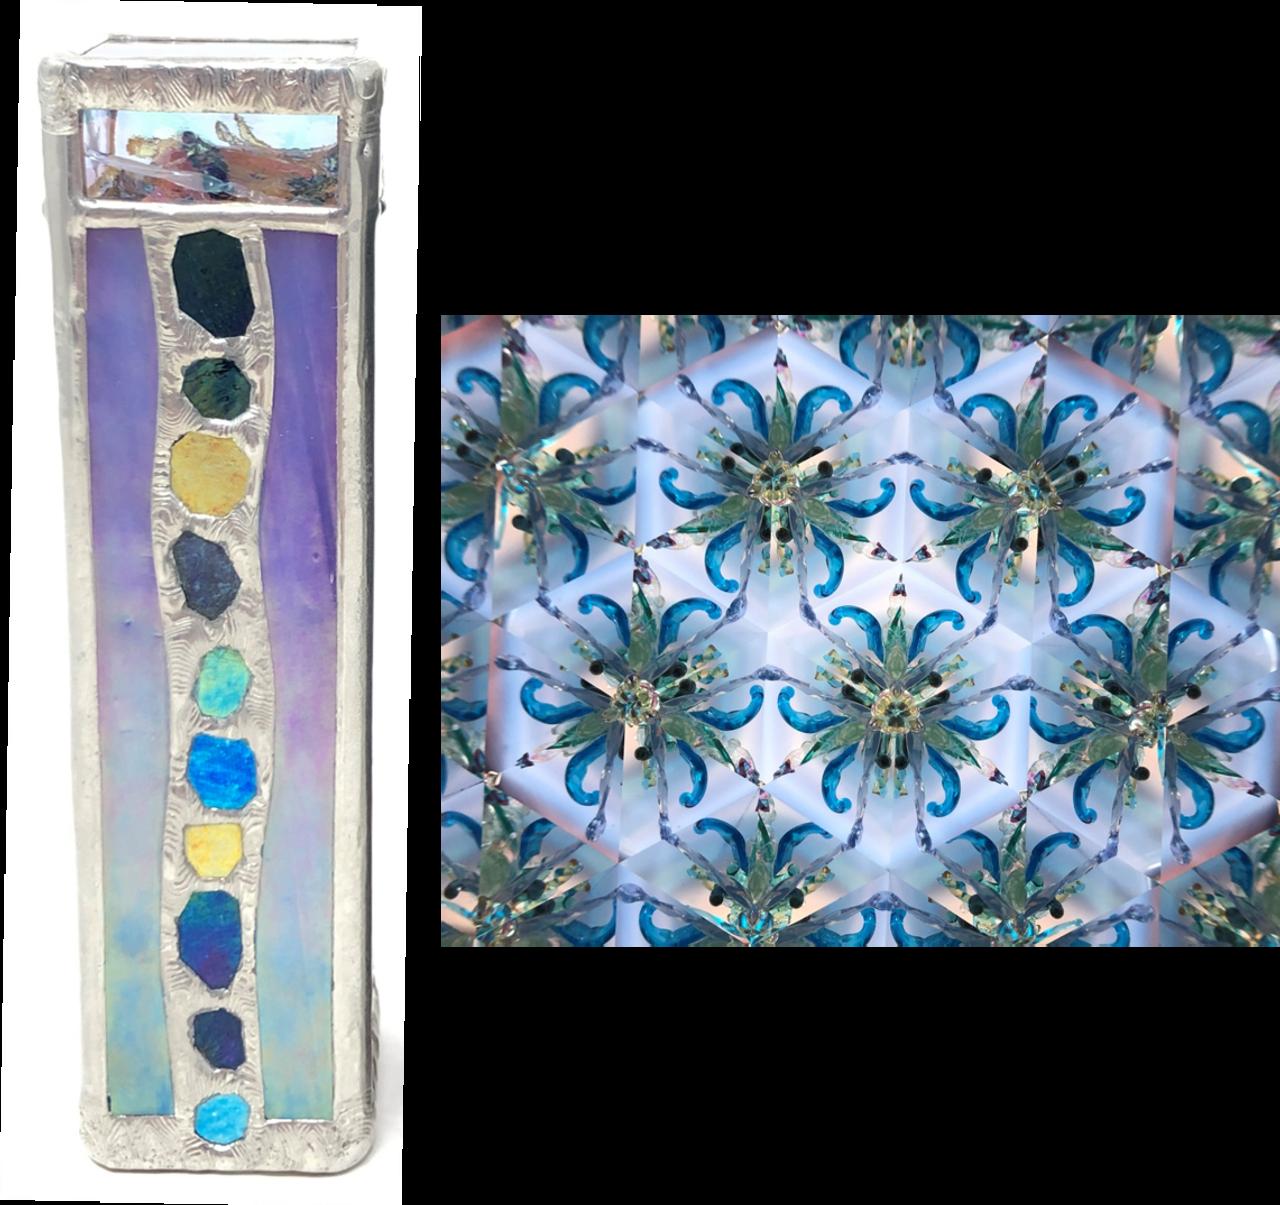 Kaleidoscope - 'Gaudi Square' in Blue by Koji Yamami - Cape ...